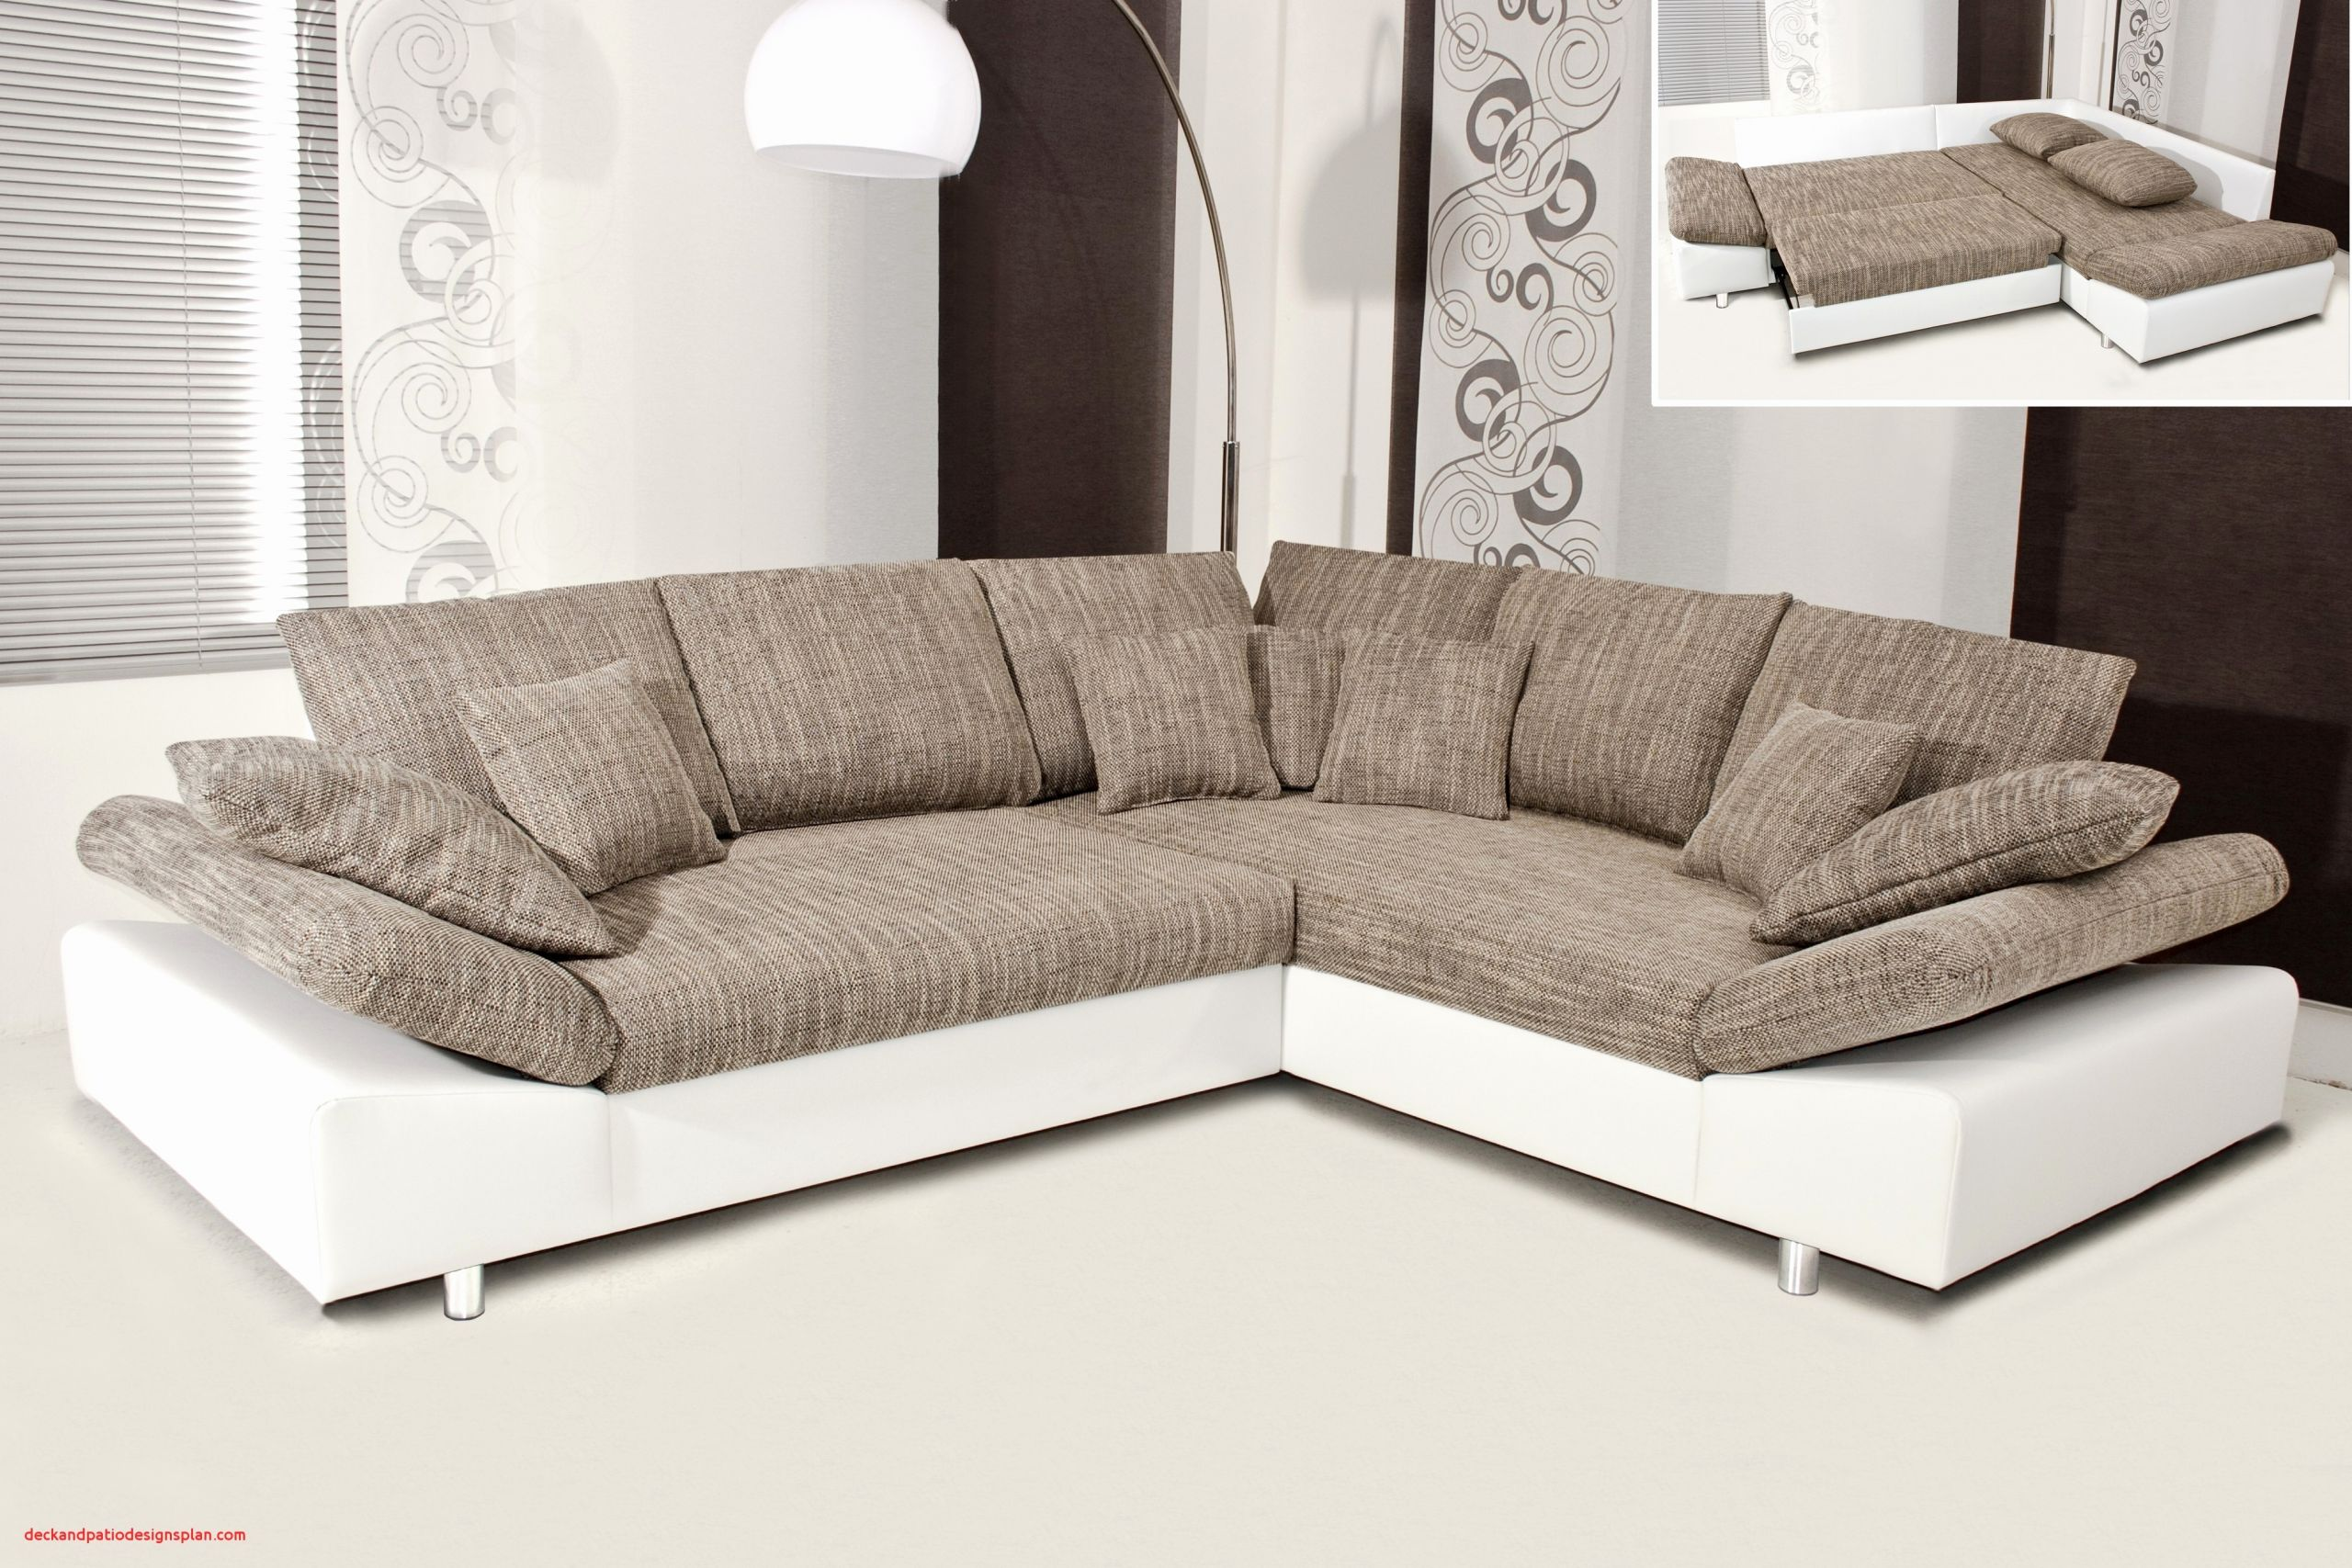 xxl lutz schlafsofa schon big sofa xxl lutz neu l schlafsofa frisch sofa und sessel sofa of xxl lutz schlafsofa